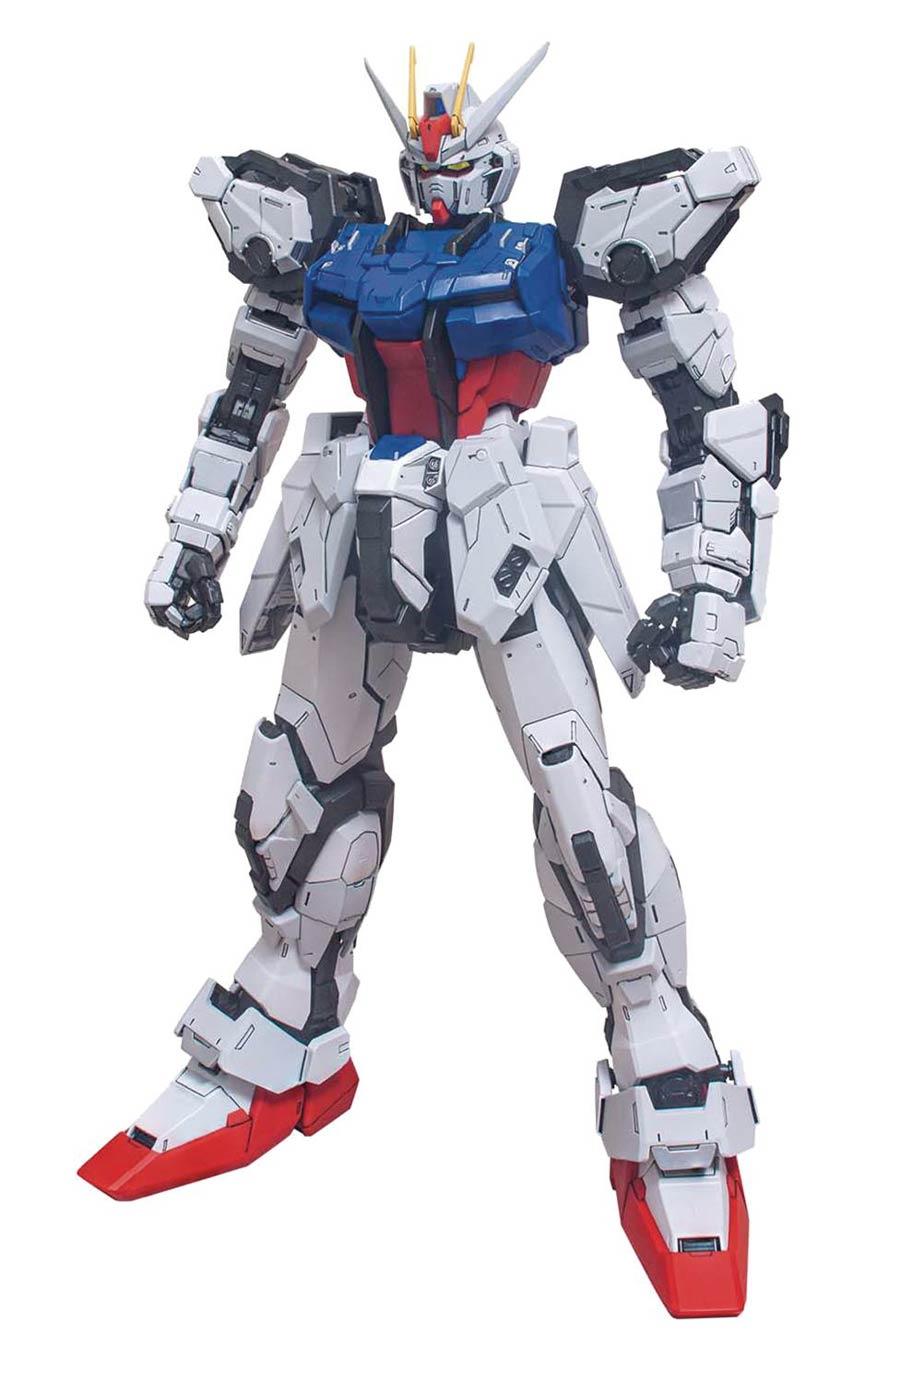 Gundam Perfect Grade 1/60 Kit - GAT-X105 + AQM/E-YM1 Perfect Strike Gundam O.M.N.I. Enforcer Mobile Suit